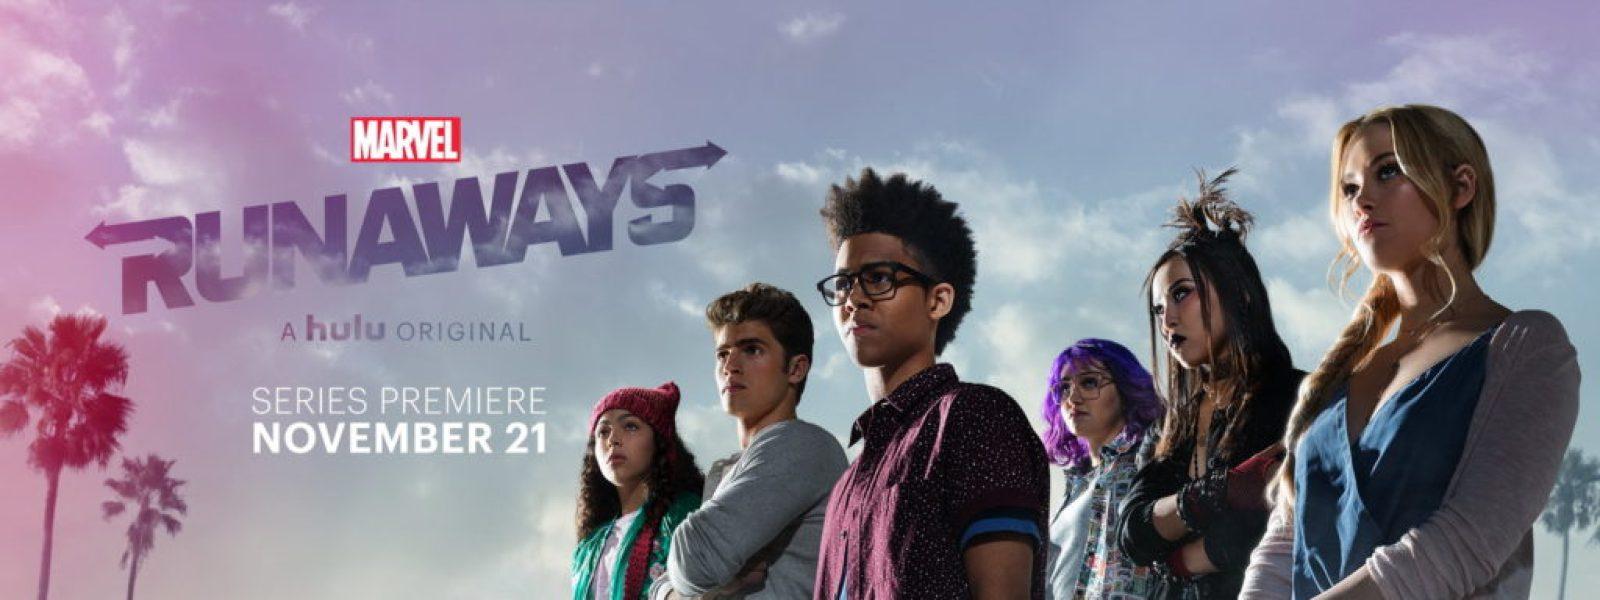 Hulu's Runaways Marvel TV Show